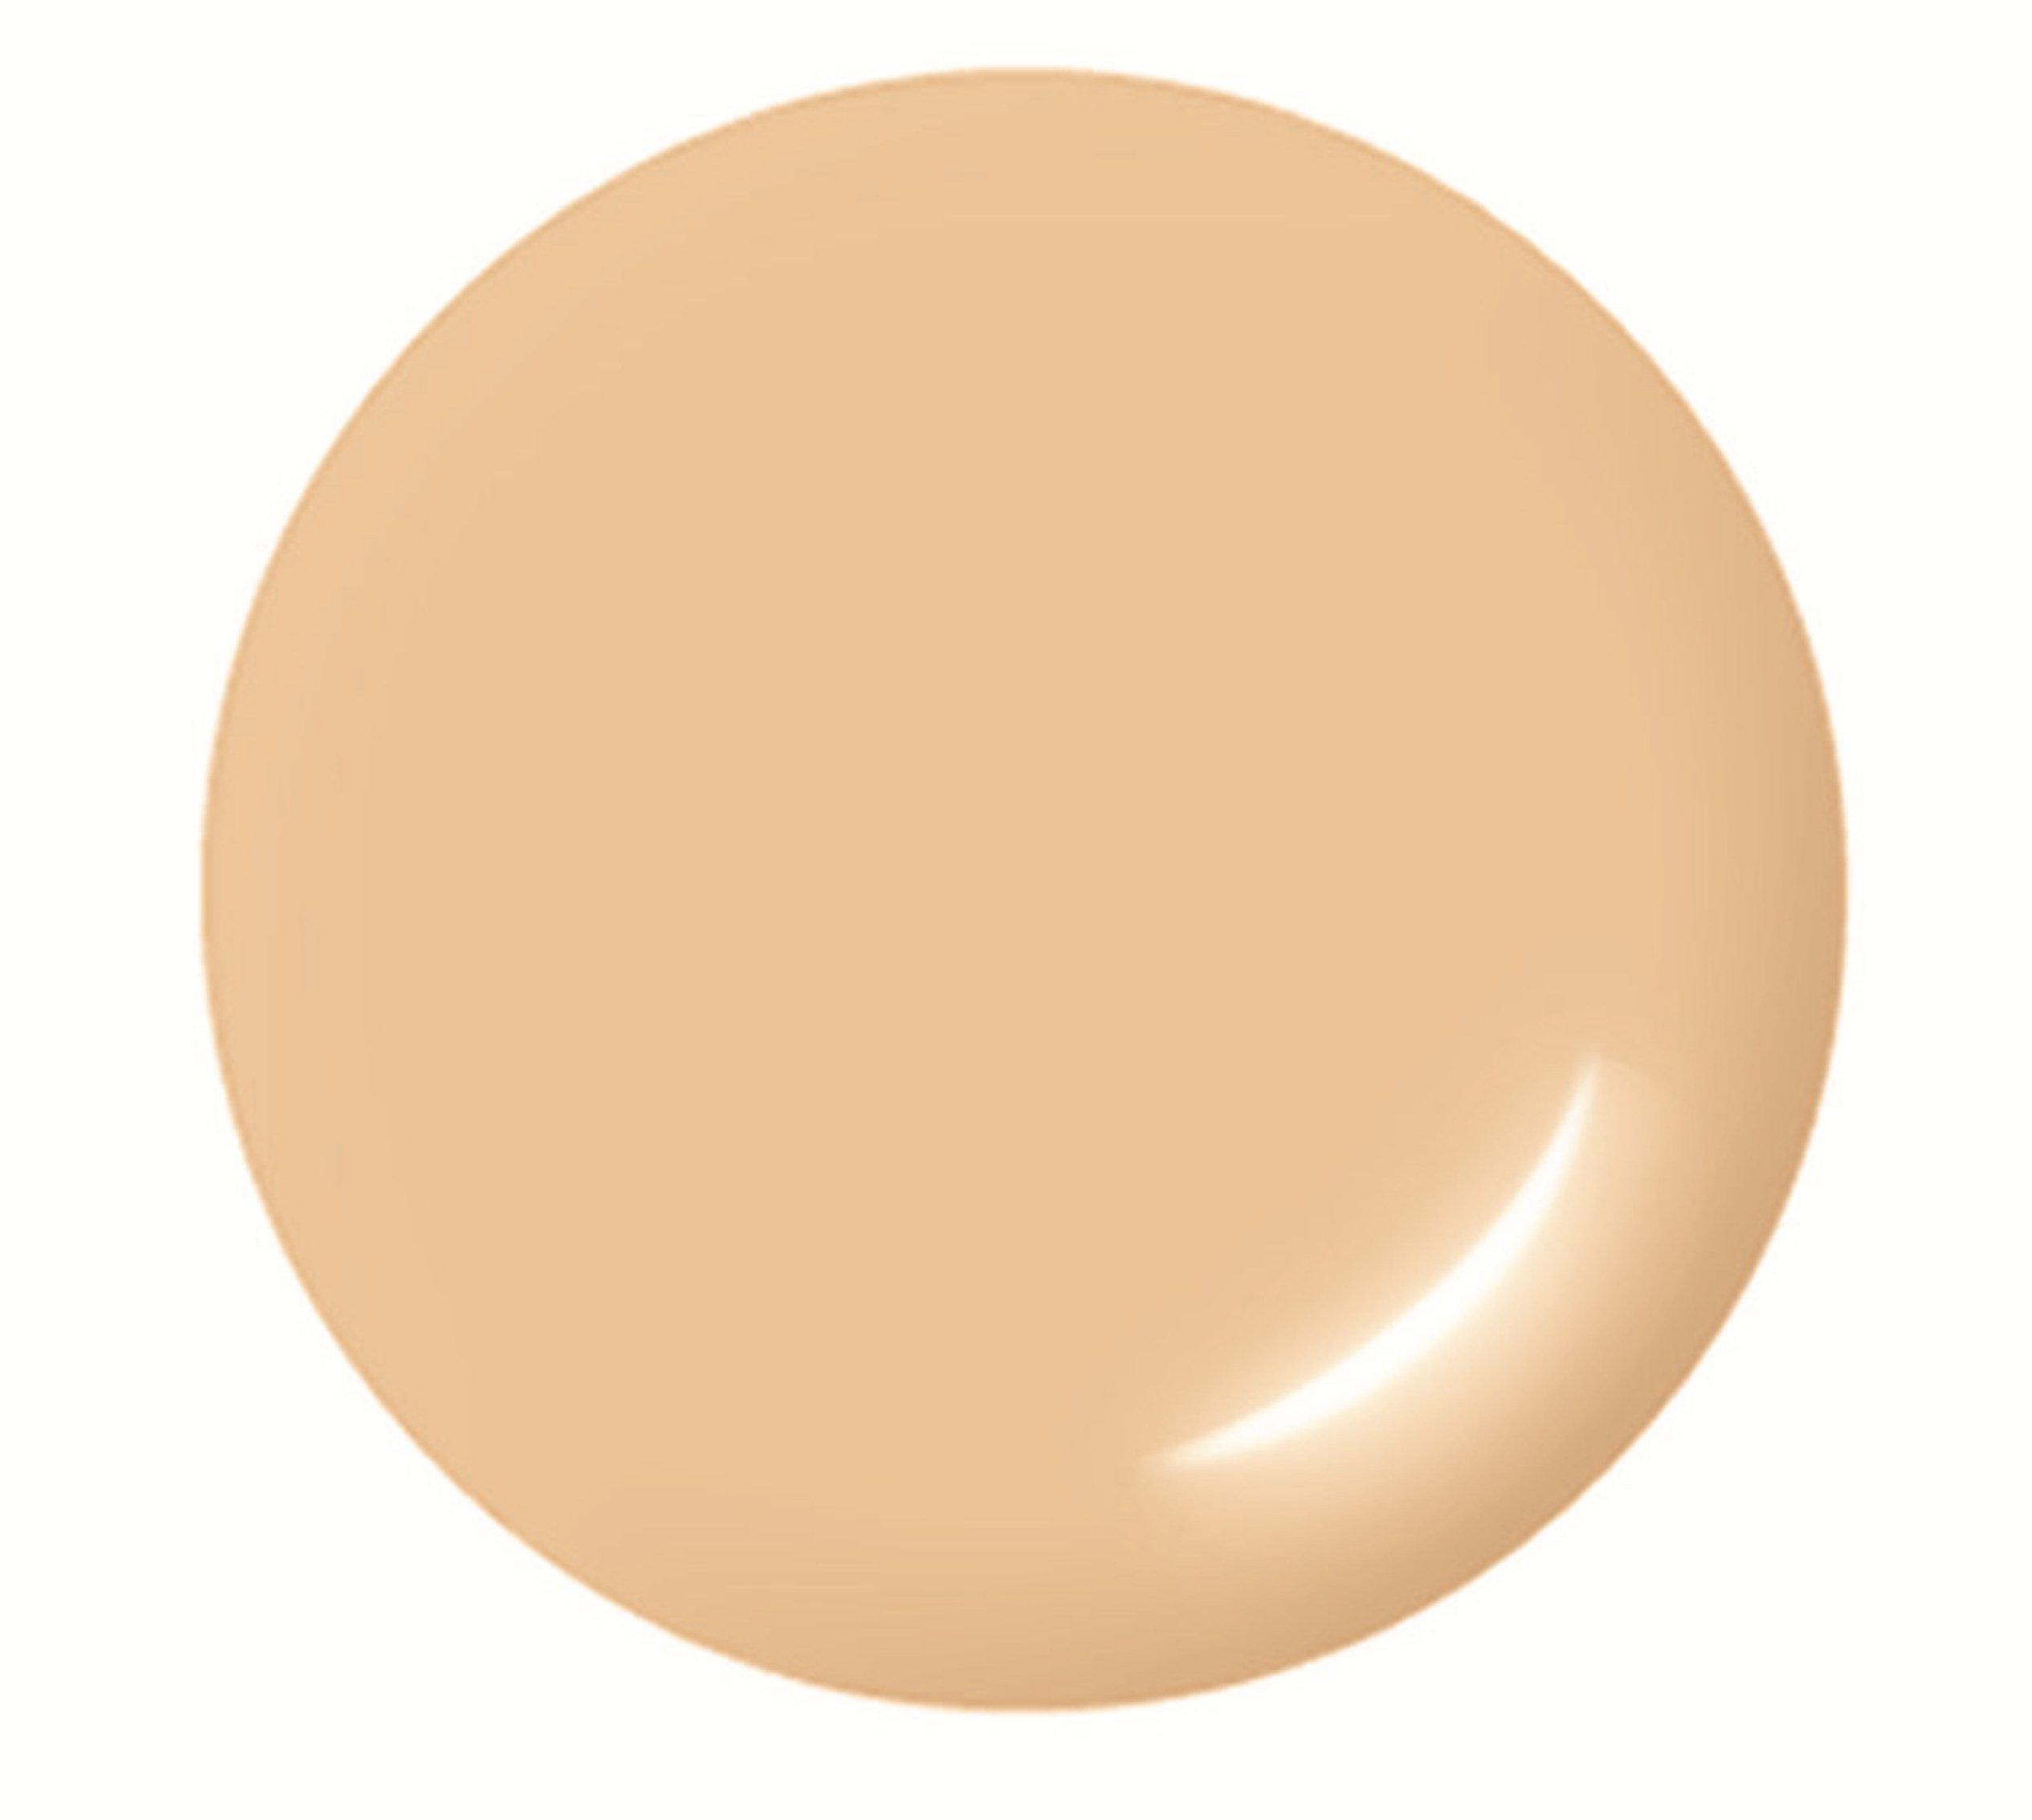 Bourjois Healthy Mix Serum Base de Maquillaje Tono 53 Light Beige - 64 gr.